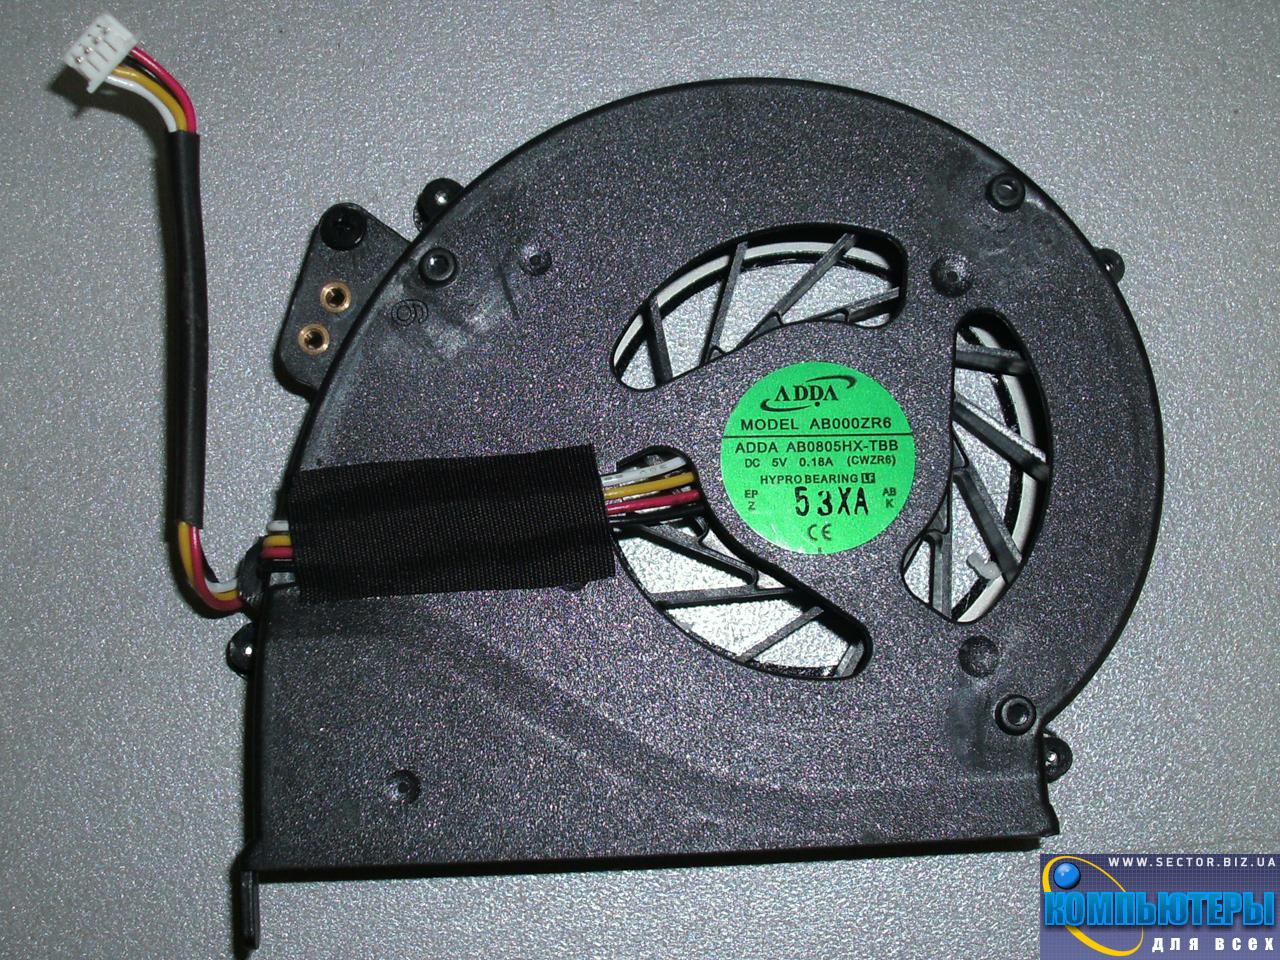 Кулер к ноутбуку Acer Extensa 5235 5635 5635G 5635Z 5635ZG ZR6 p/n: AB0805HX-TBB (CWZR6). Фото № 1.